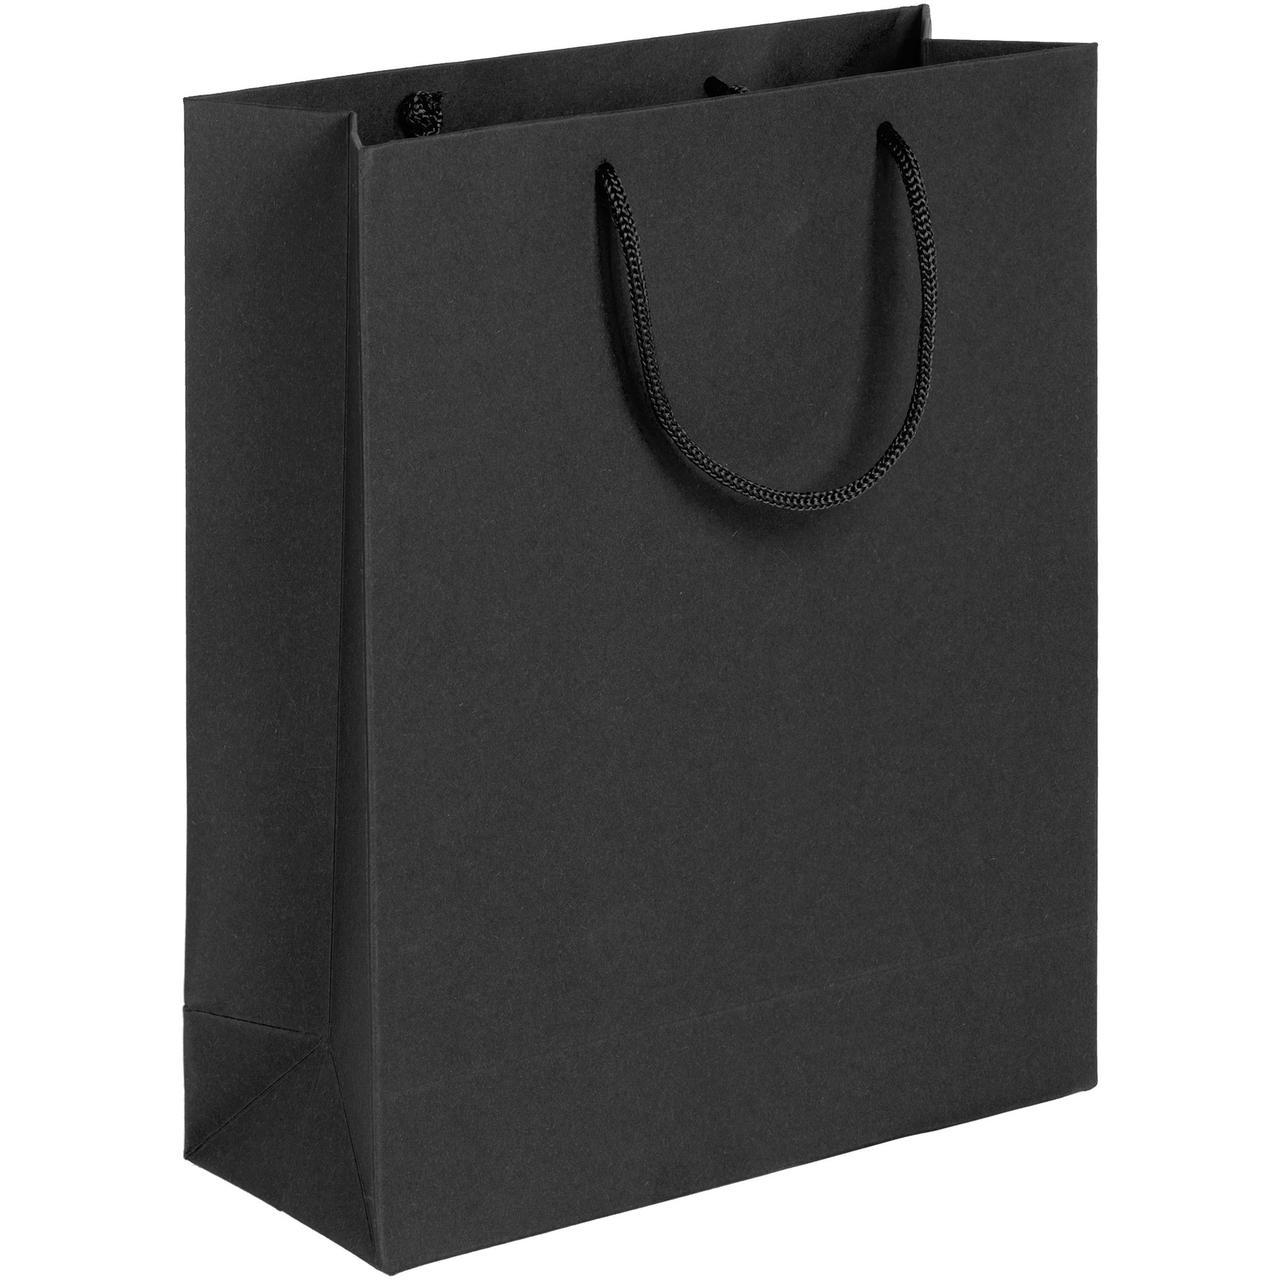 Пакет Ample M, черный (артикул 7440.30)